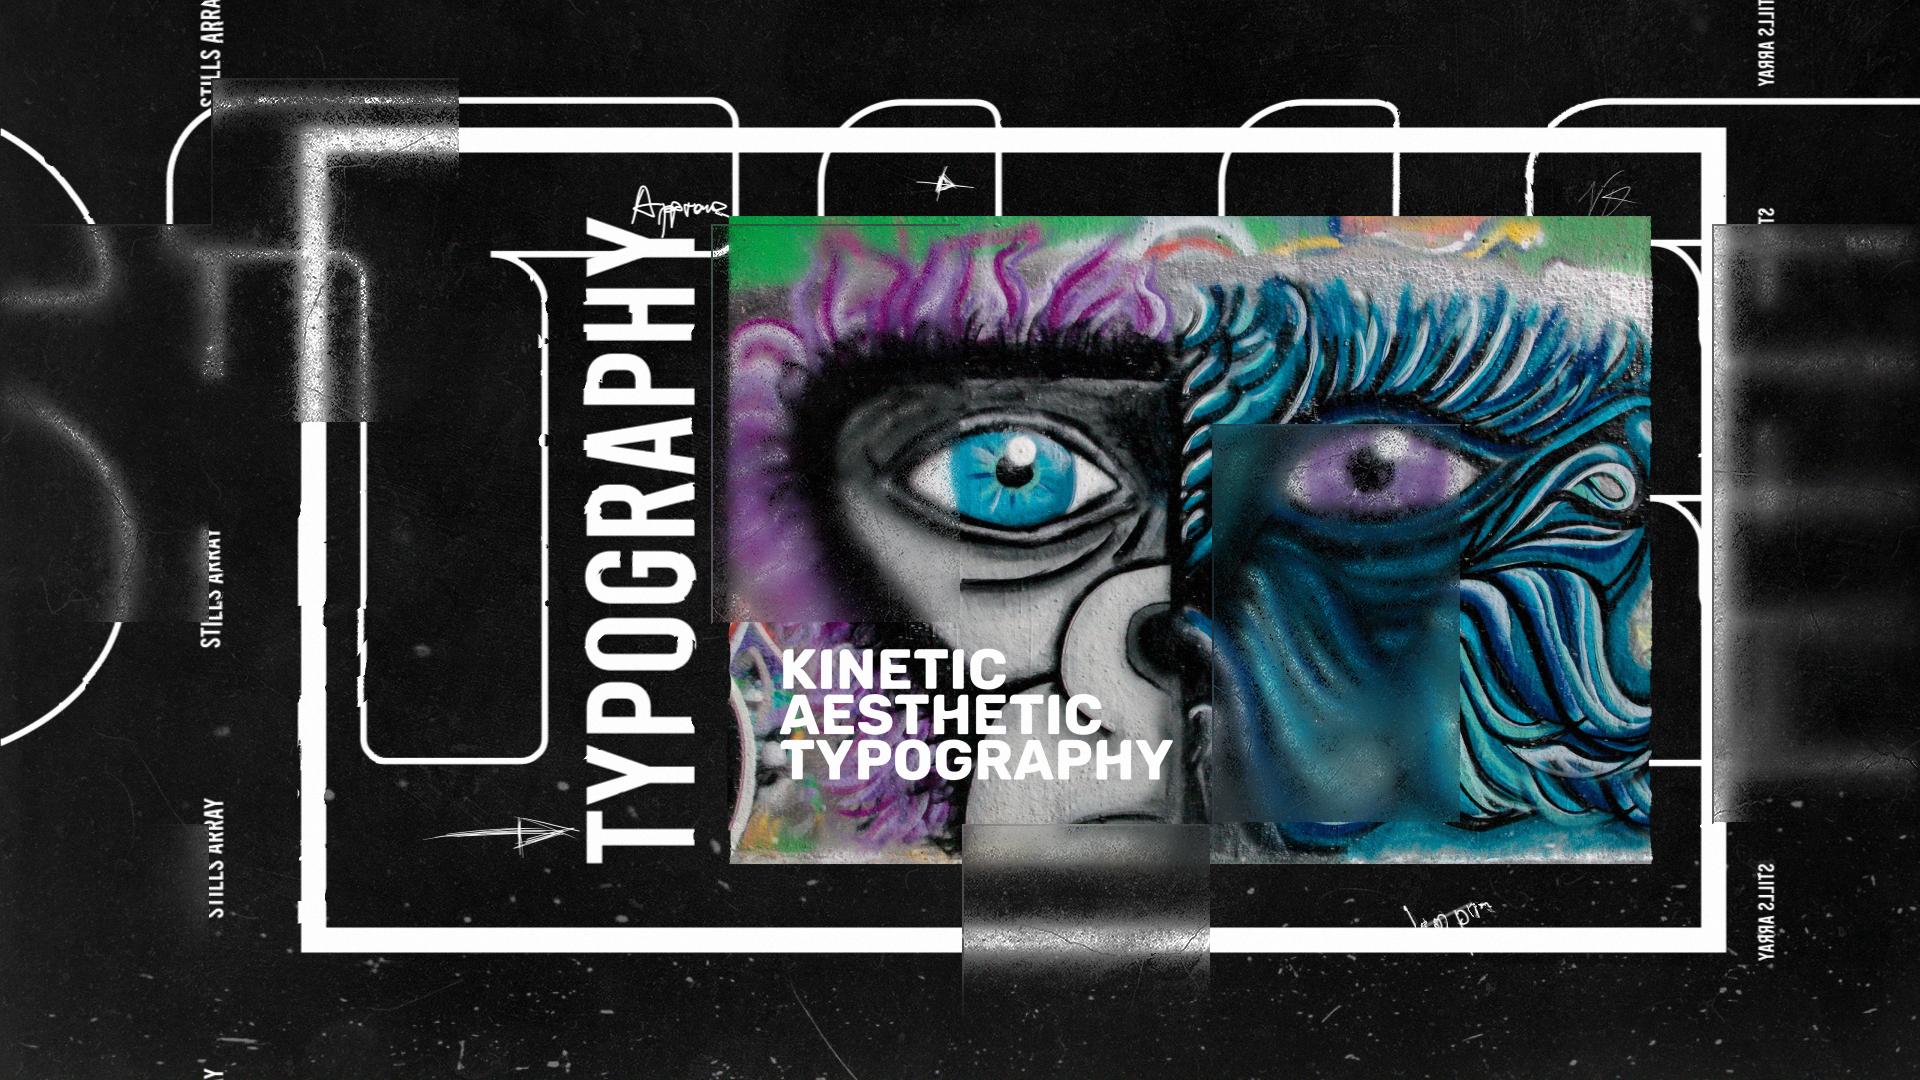 Art of The Title | Kinetic Aesthetic Typography - 6